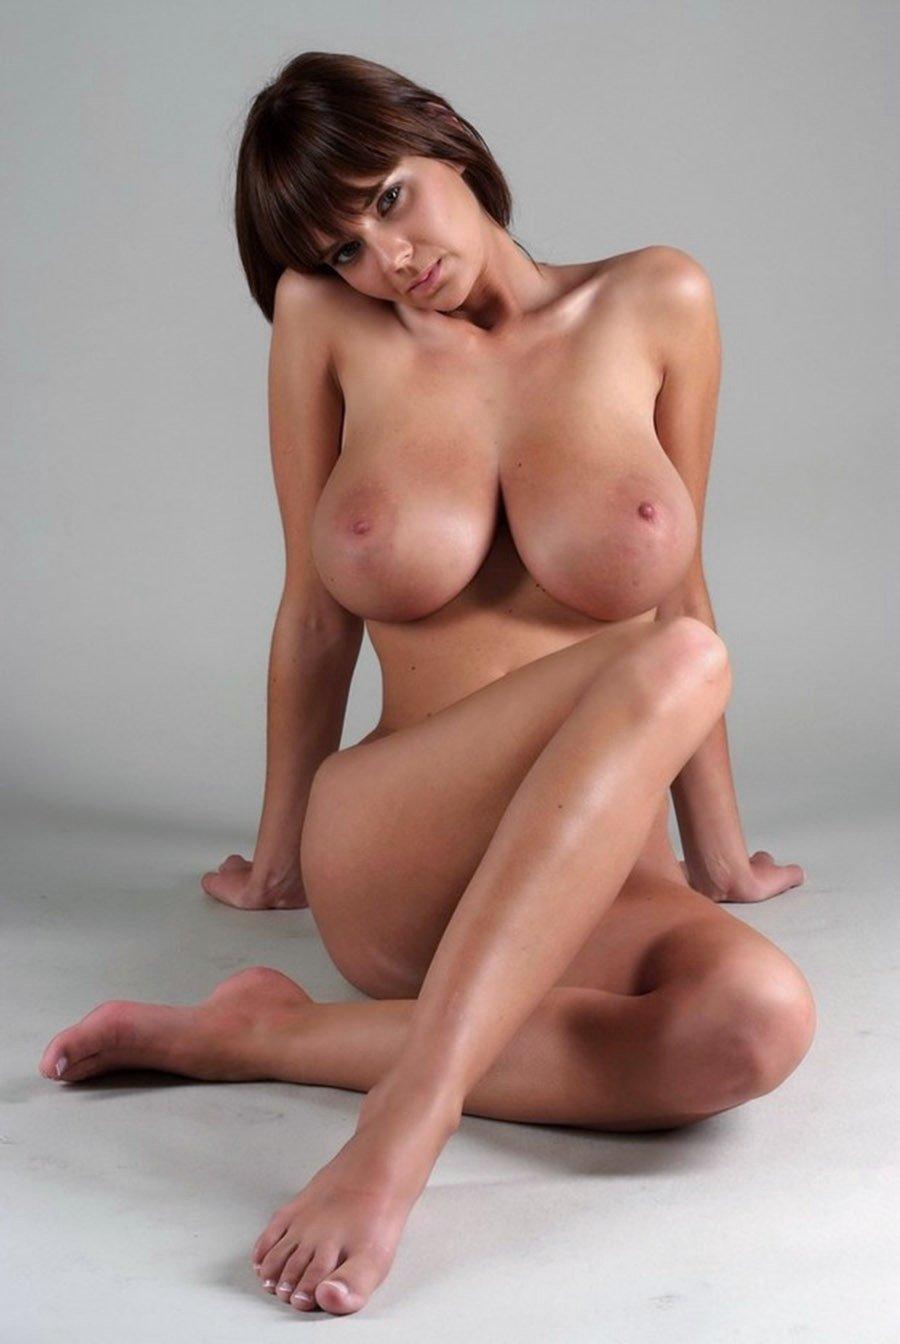 very nice modeling girlxxx